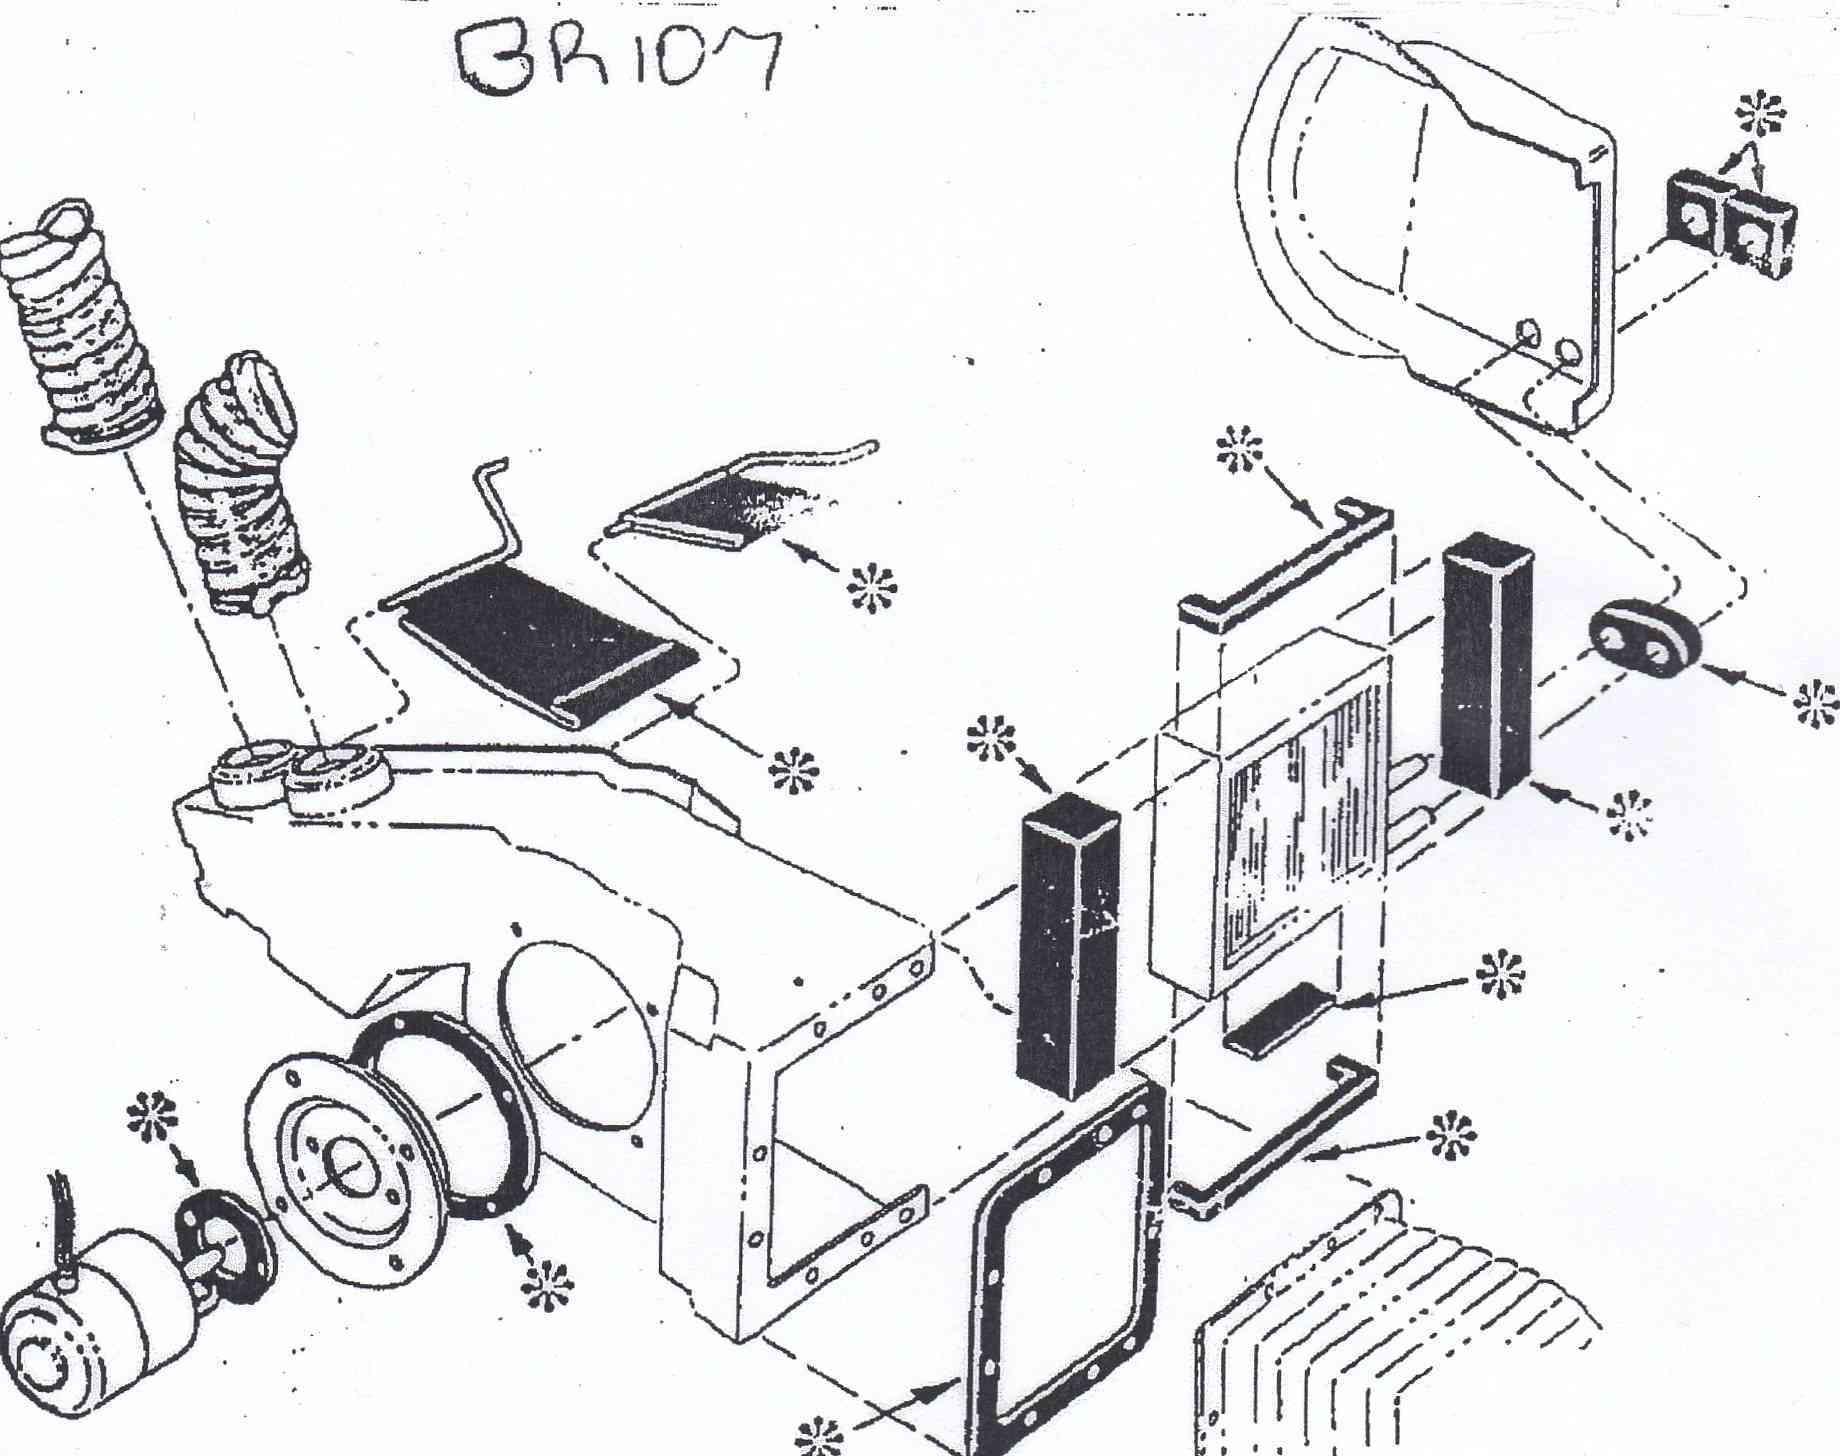 Refurbishing F100 Heater Box